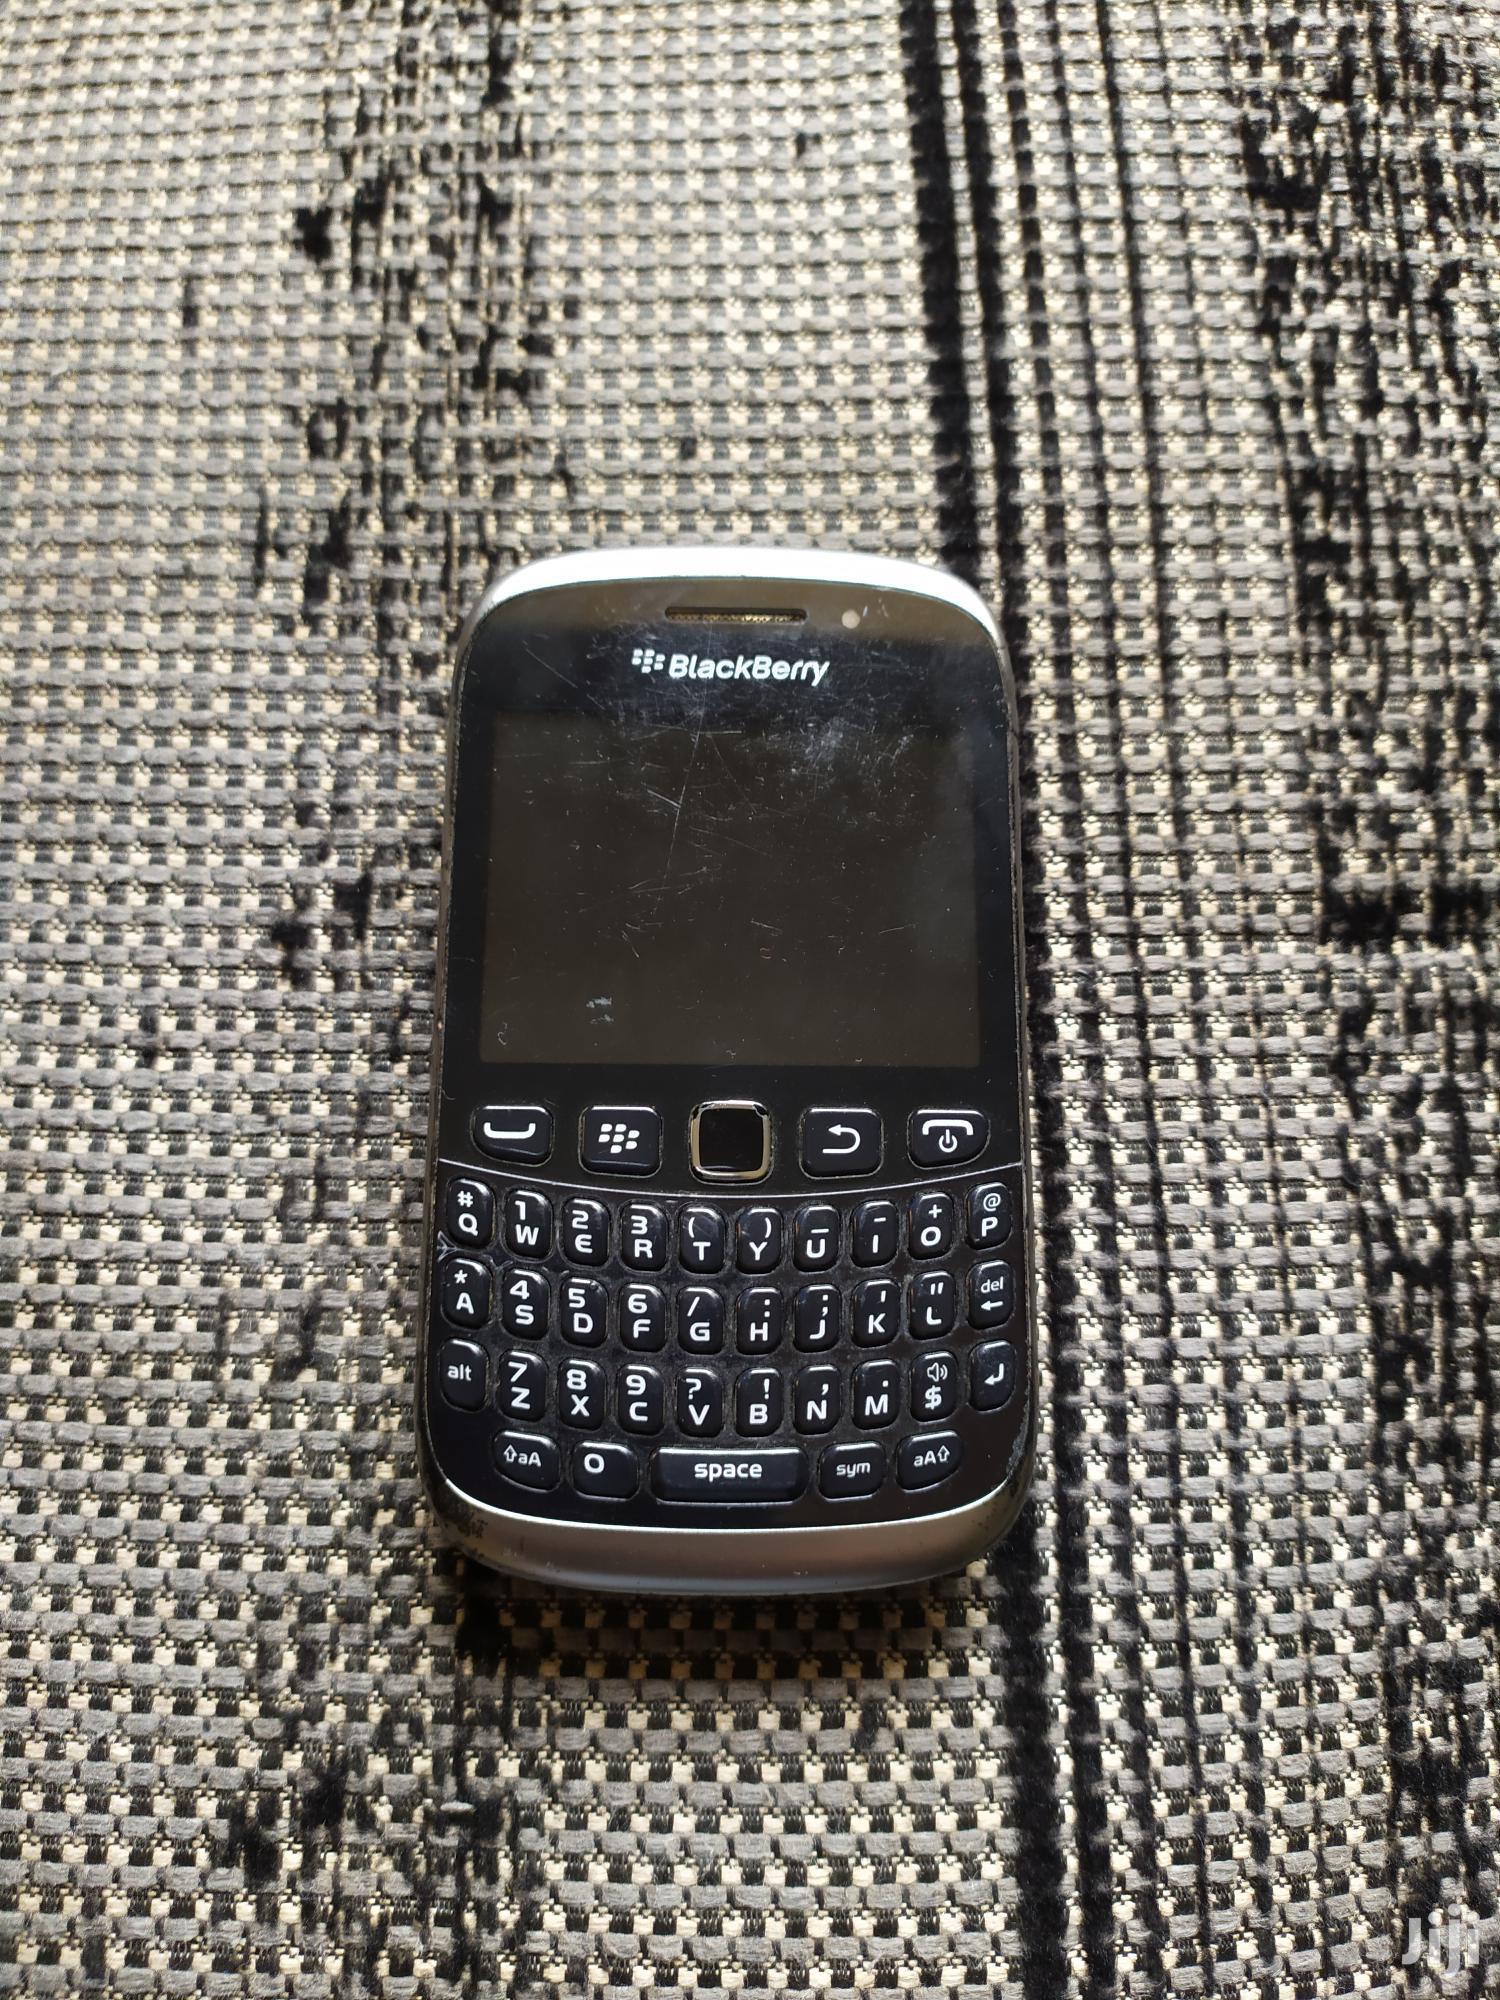 BlackBerry Curve 9320 Black | Mobile Phones for sale in Ojodu, Lagos State, Nigeria